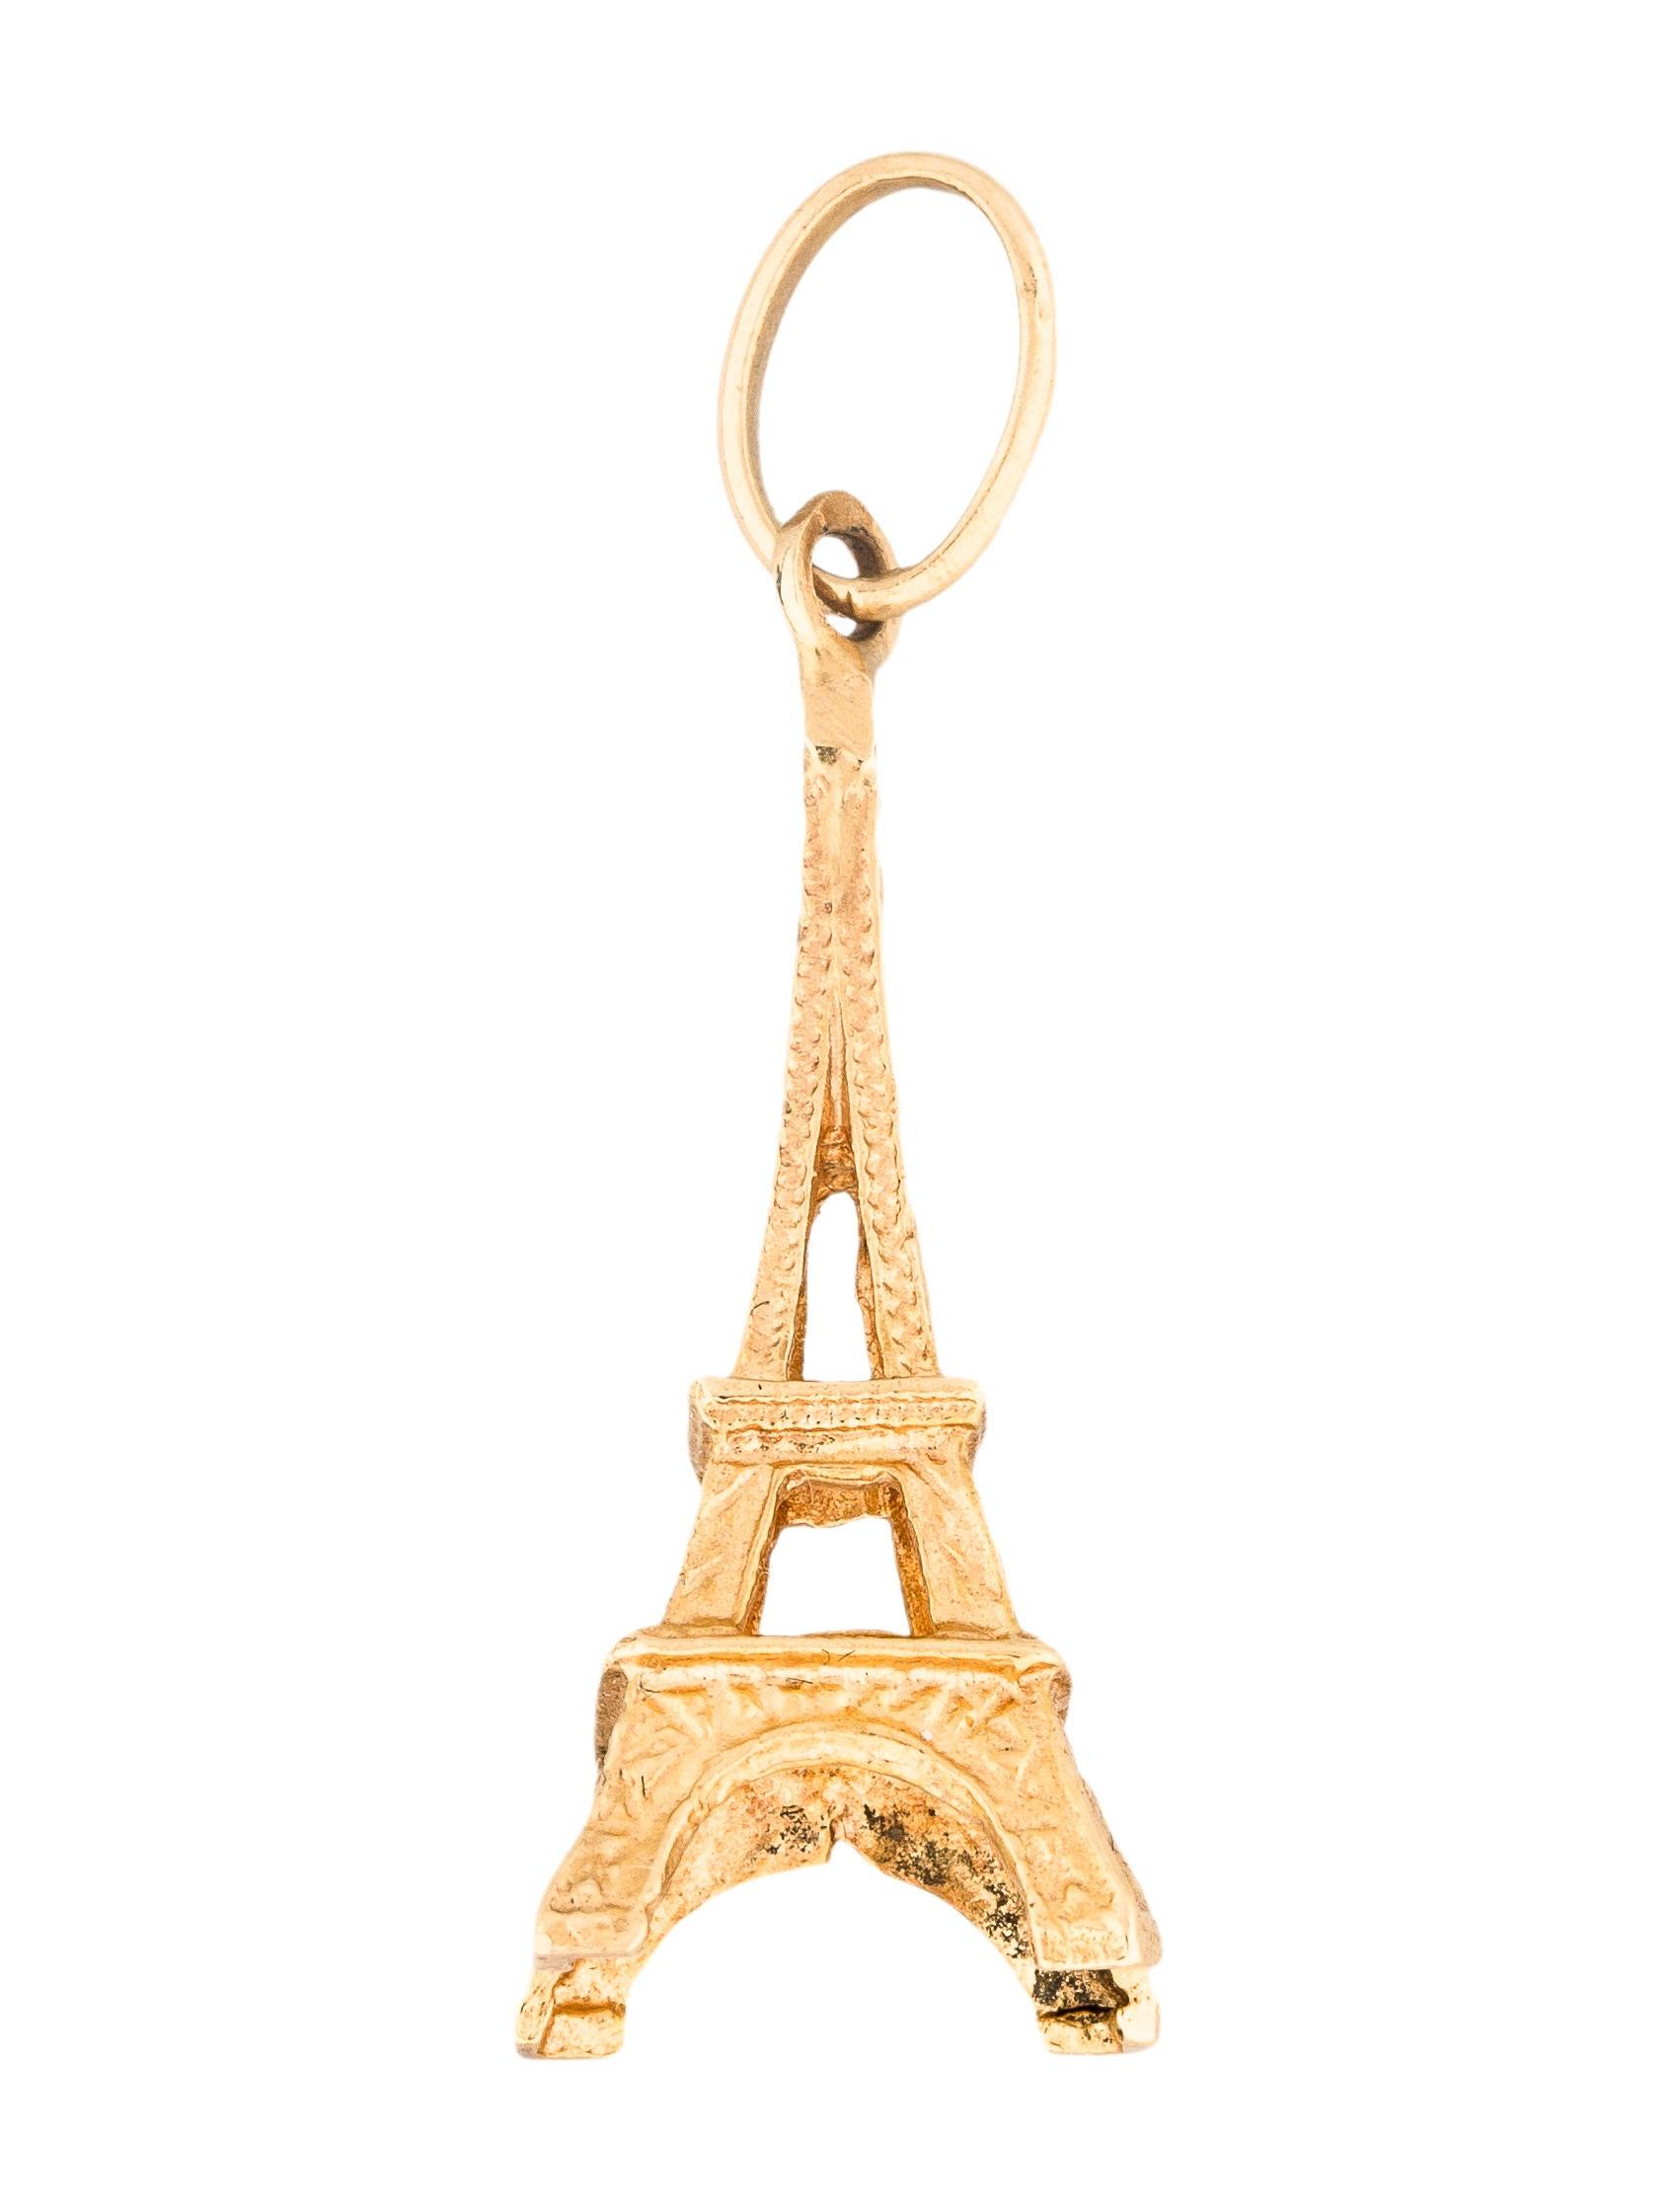 18k eiffel tower pendant necklaces penda22818 the